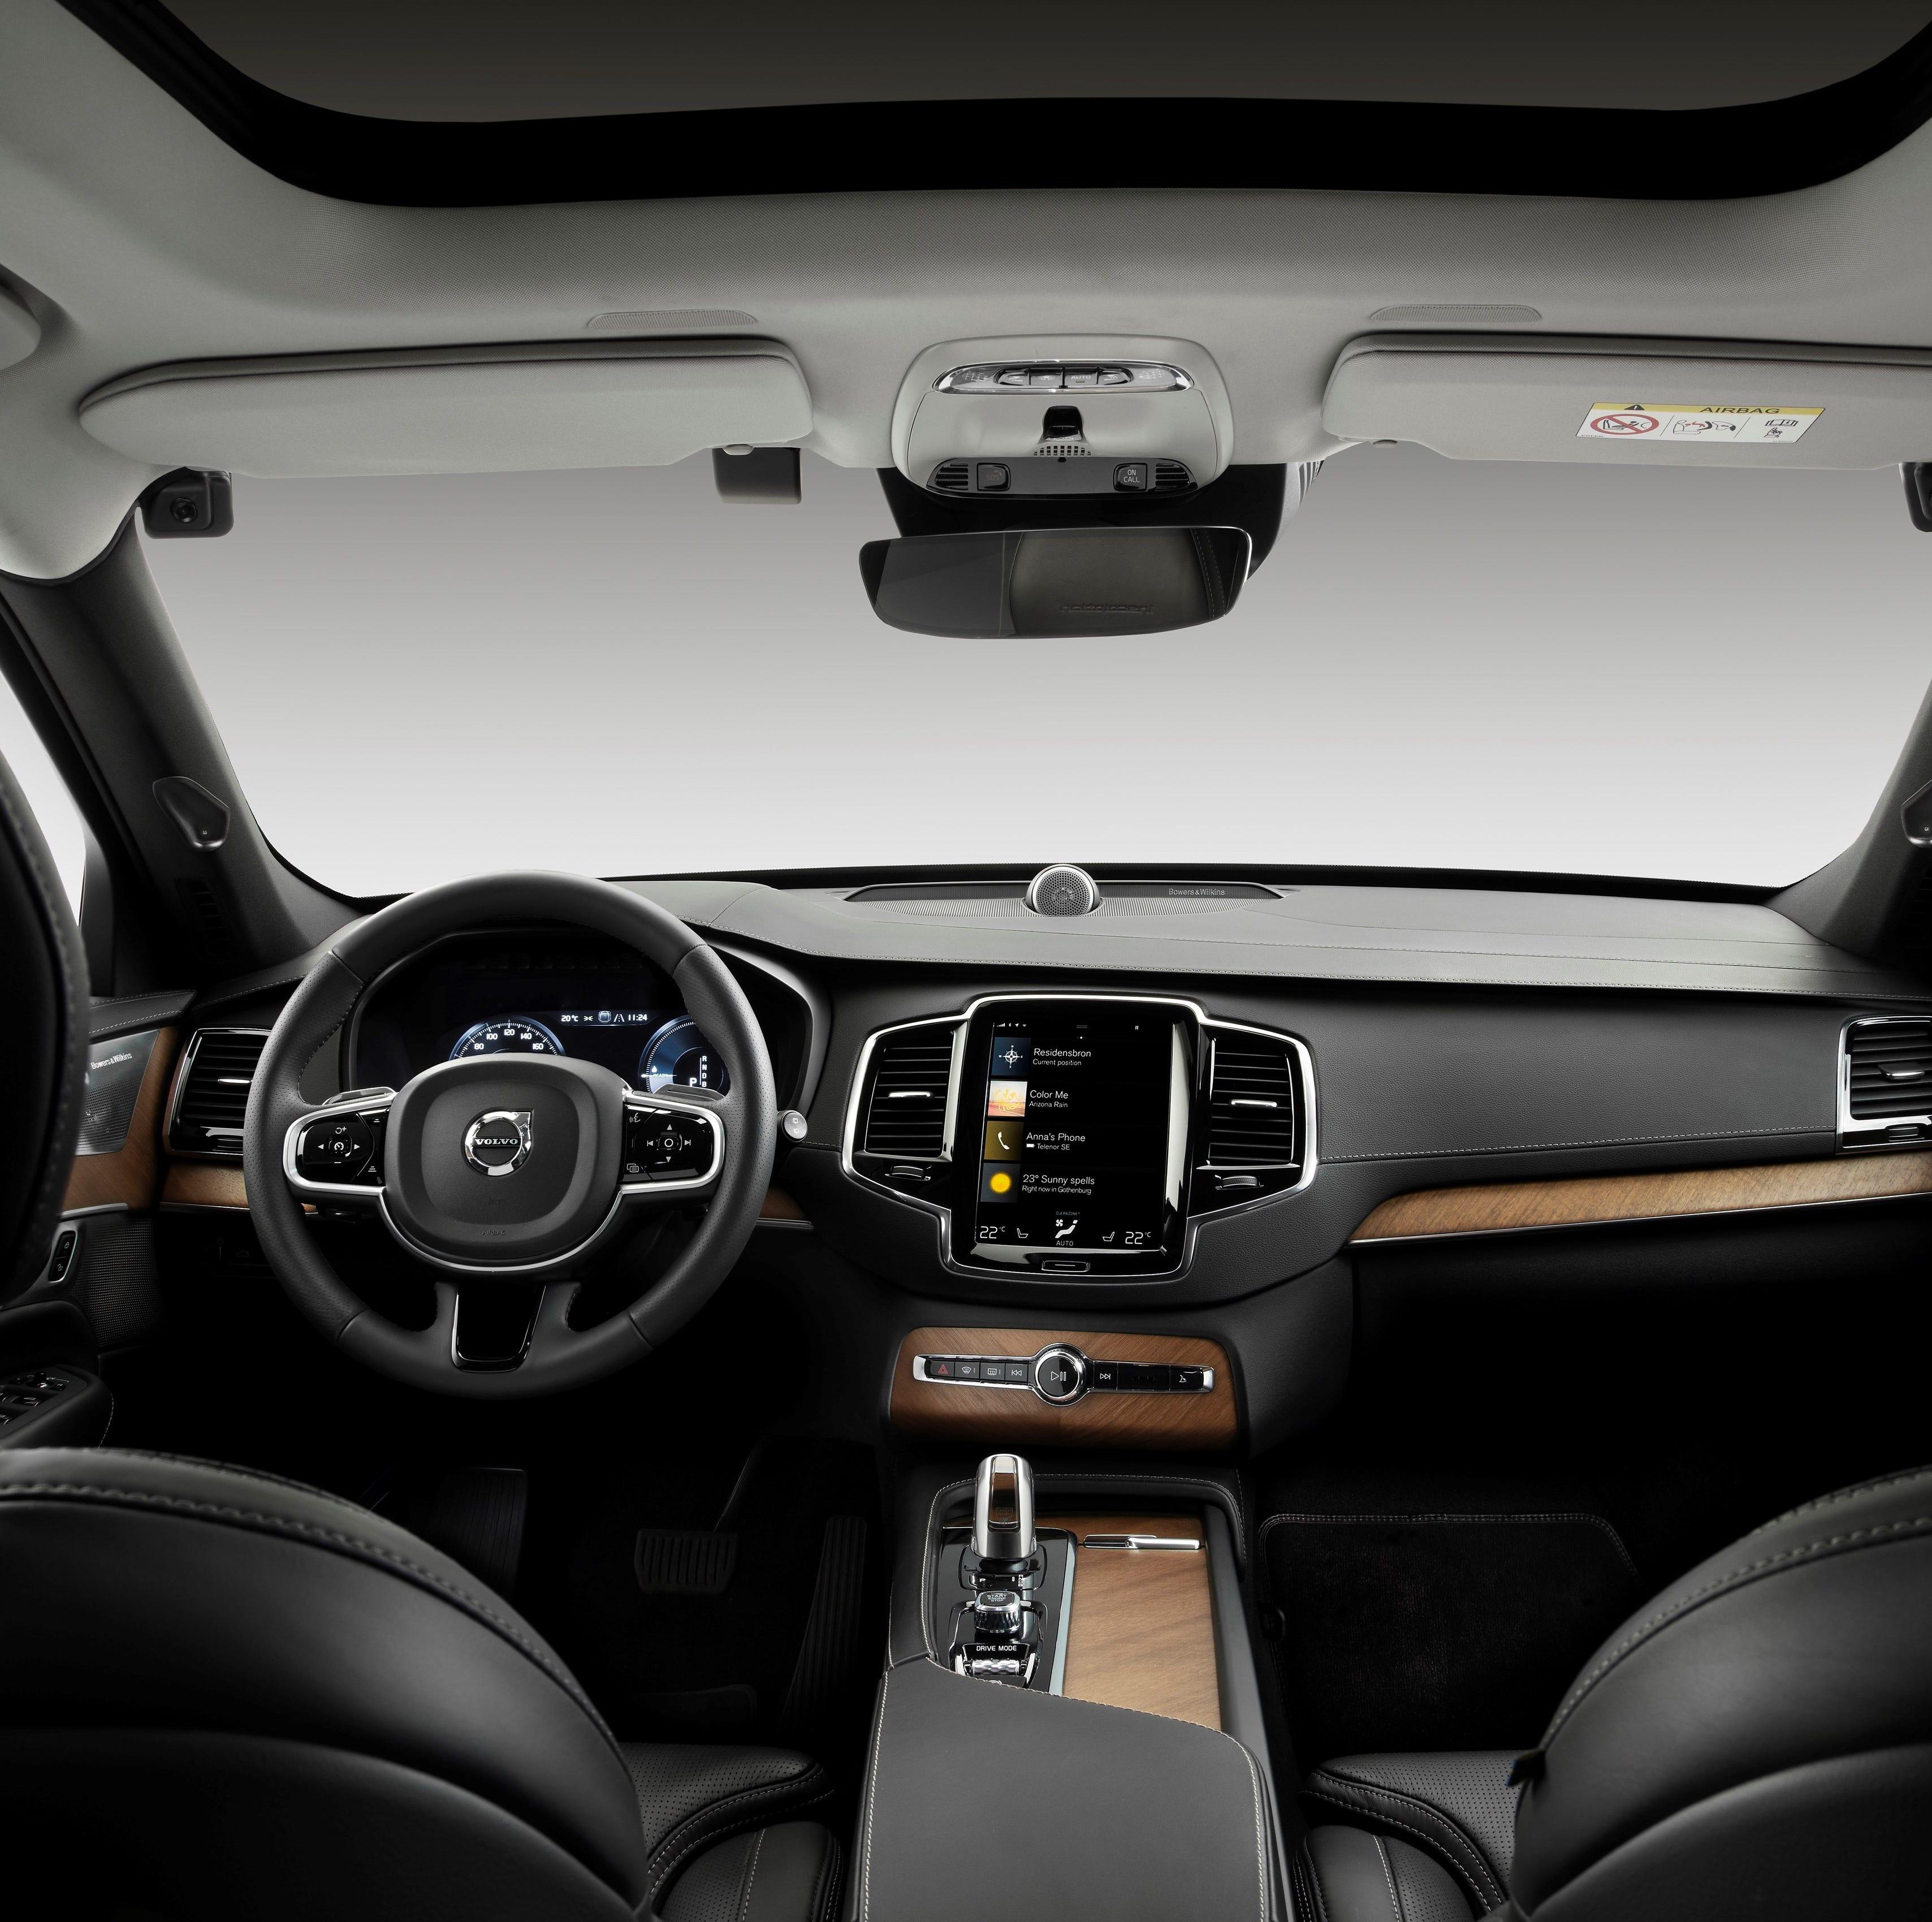 Driver Monitoring Camera in a Volvo research...